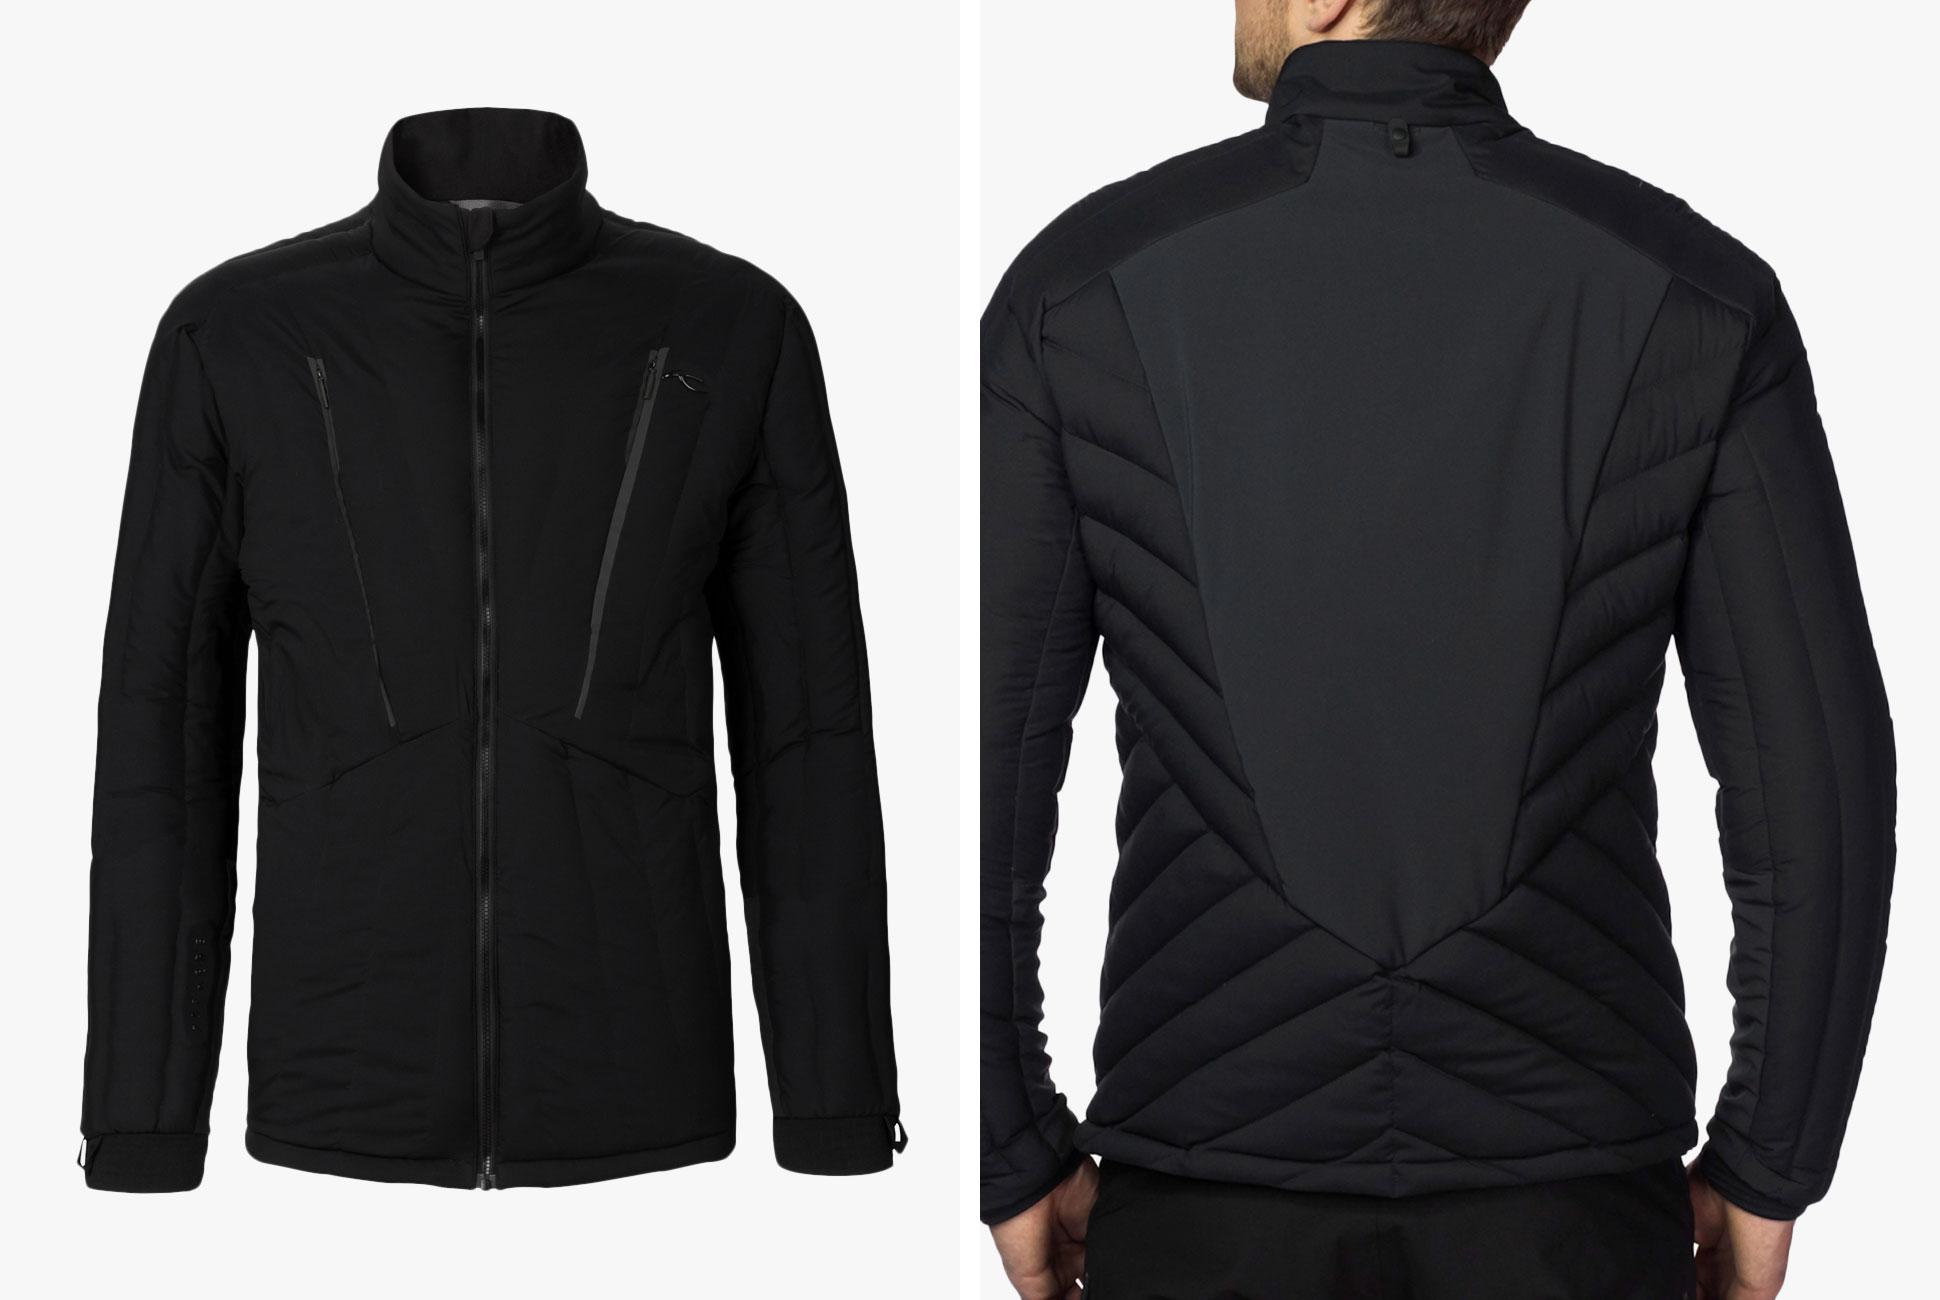 down jackets kjus 7sphere down jacket MFPSUNN